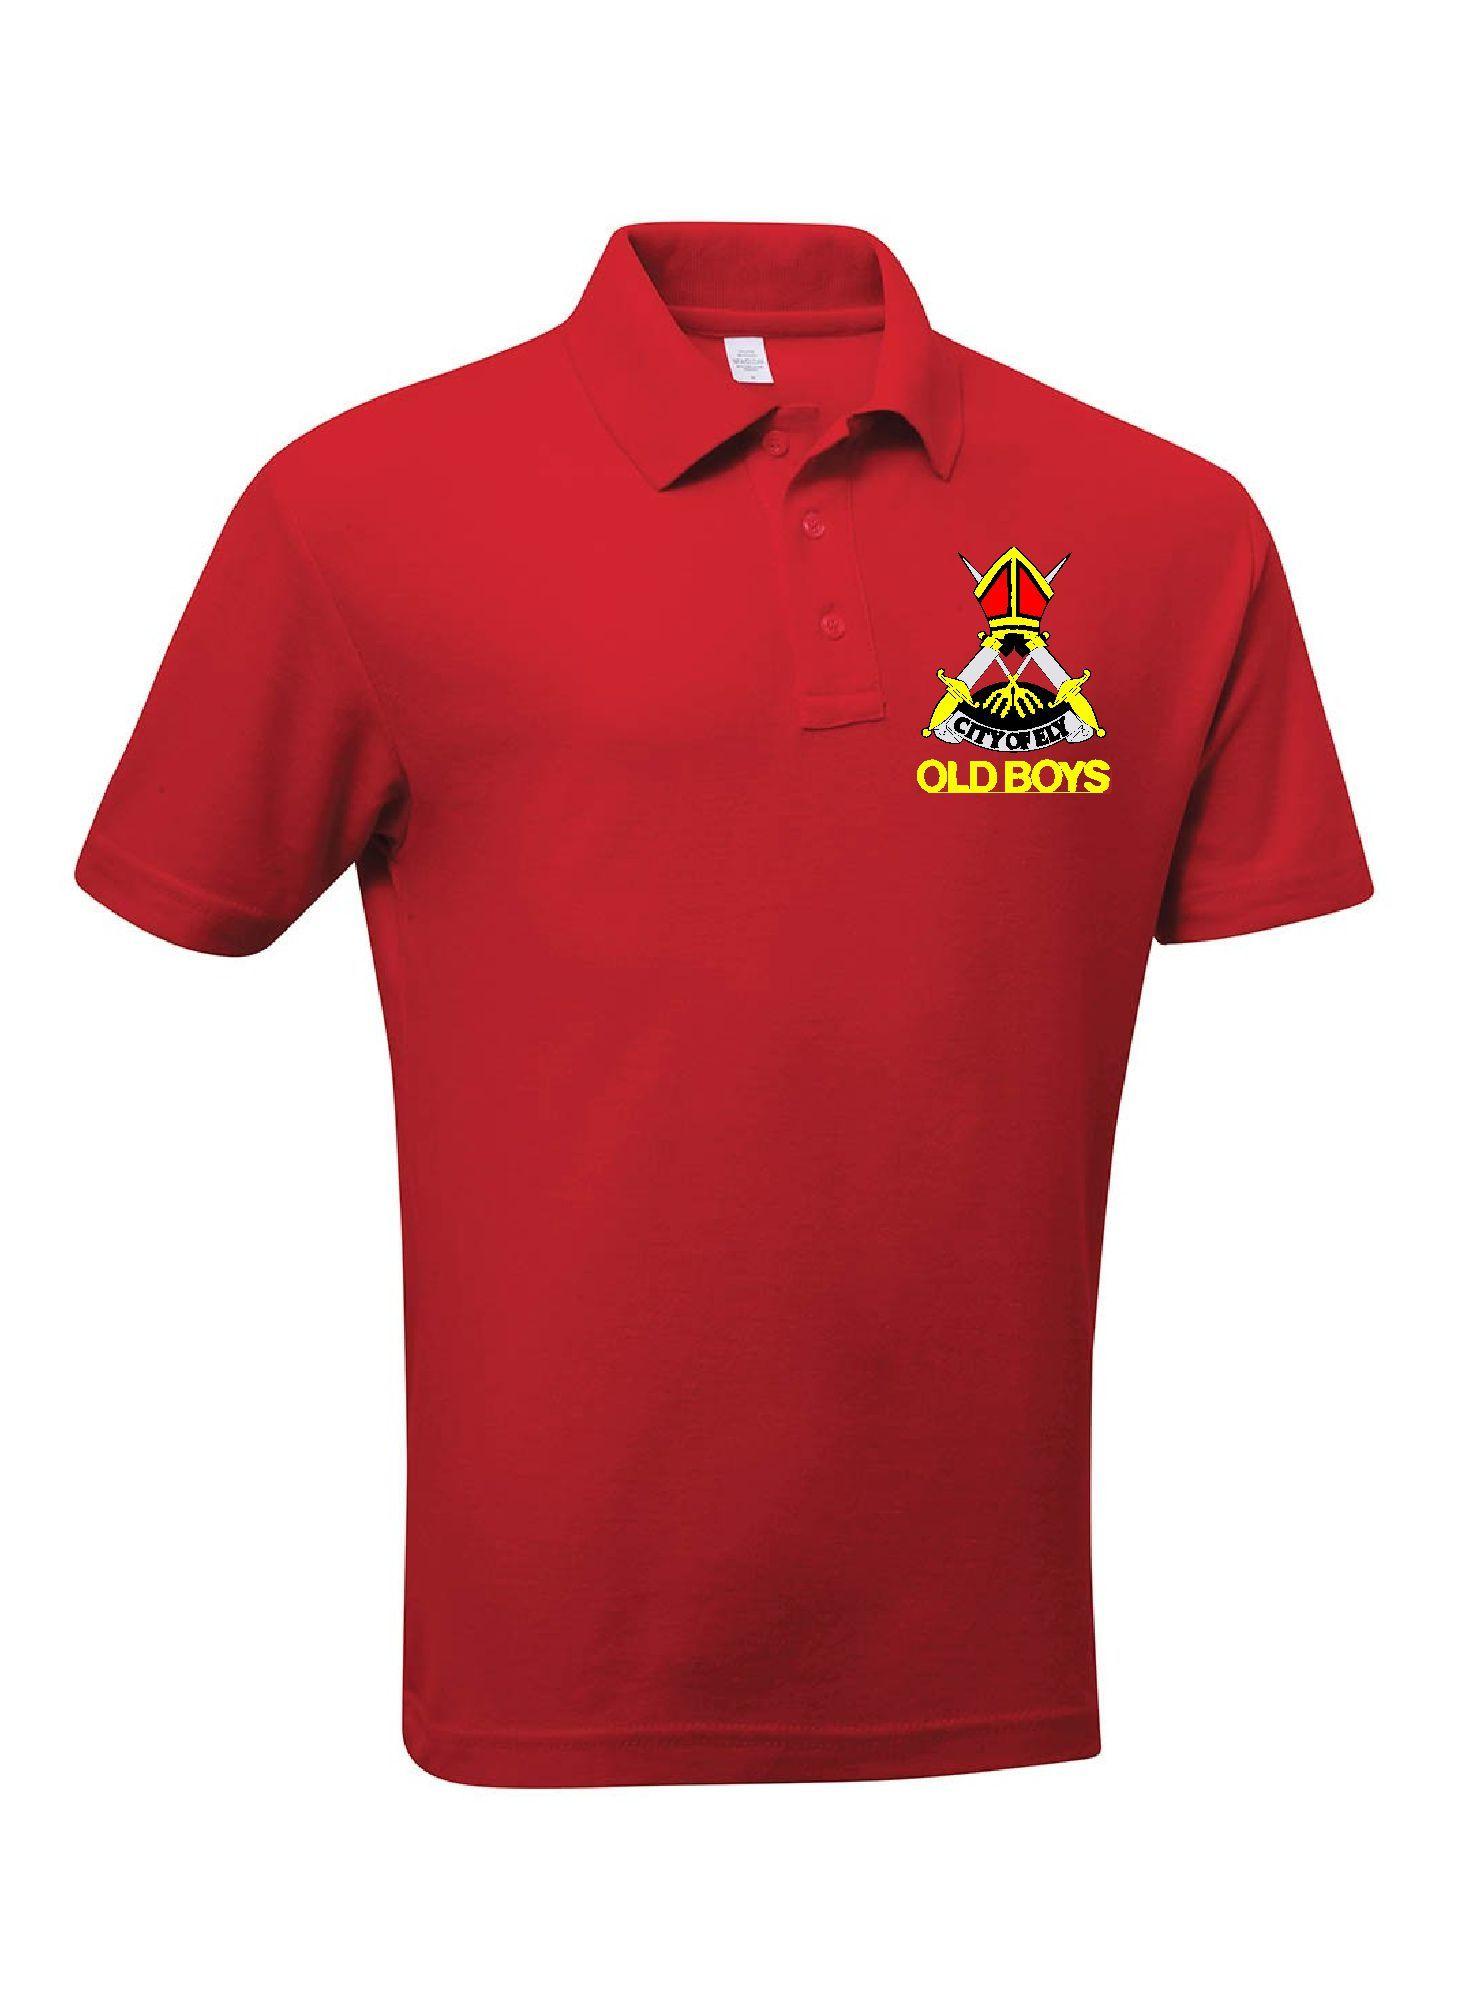 Ely City Hockey Club - 'Old Boys' Polo Shirt